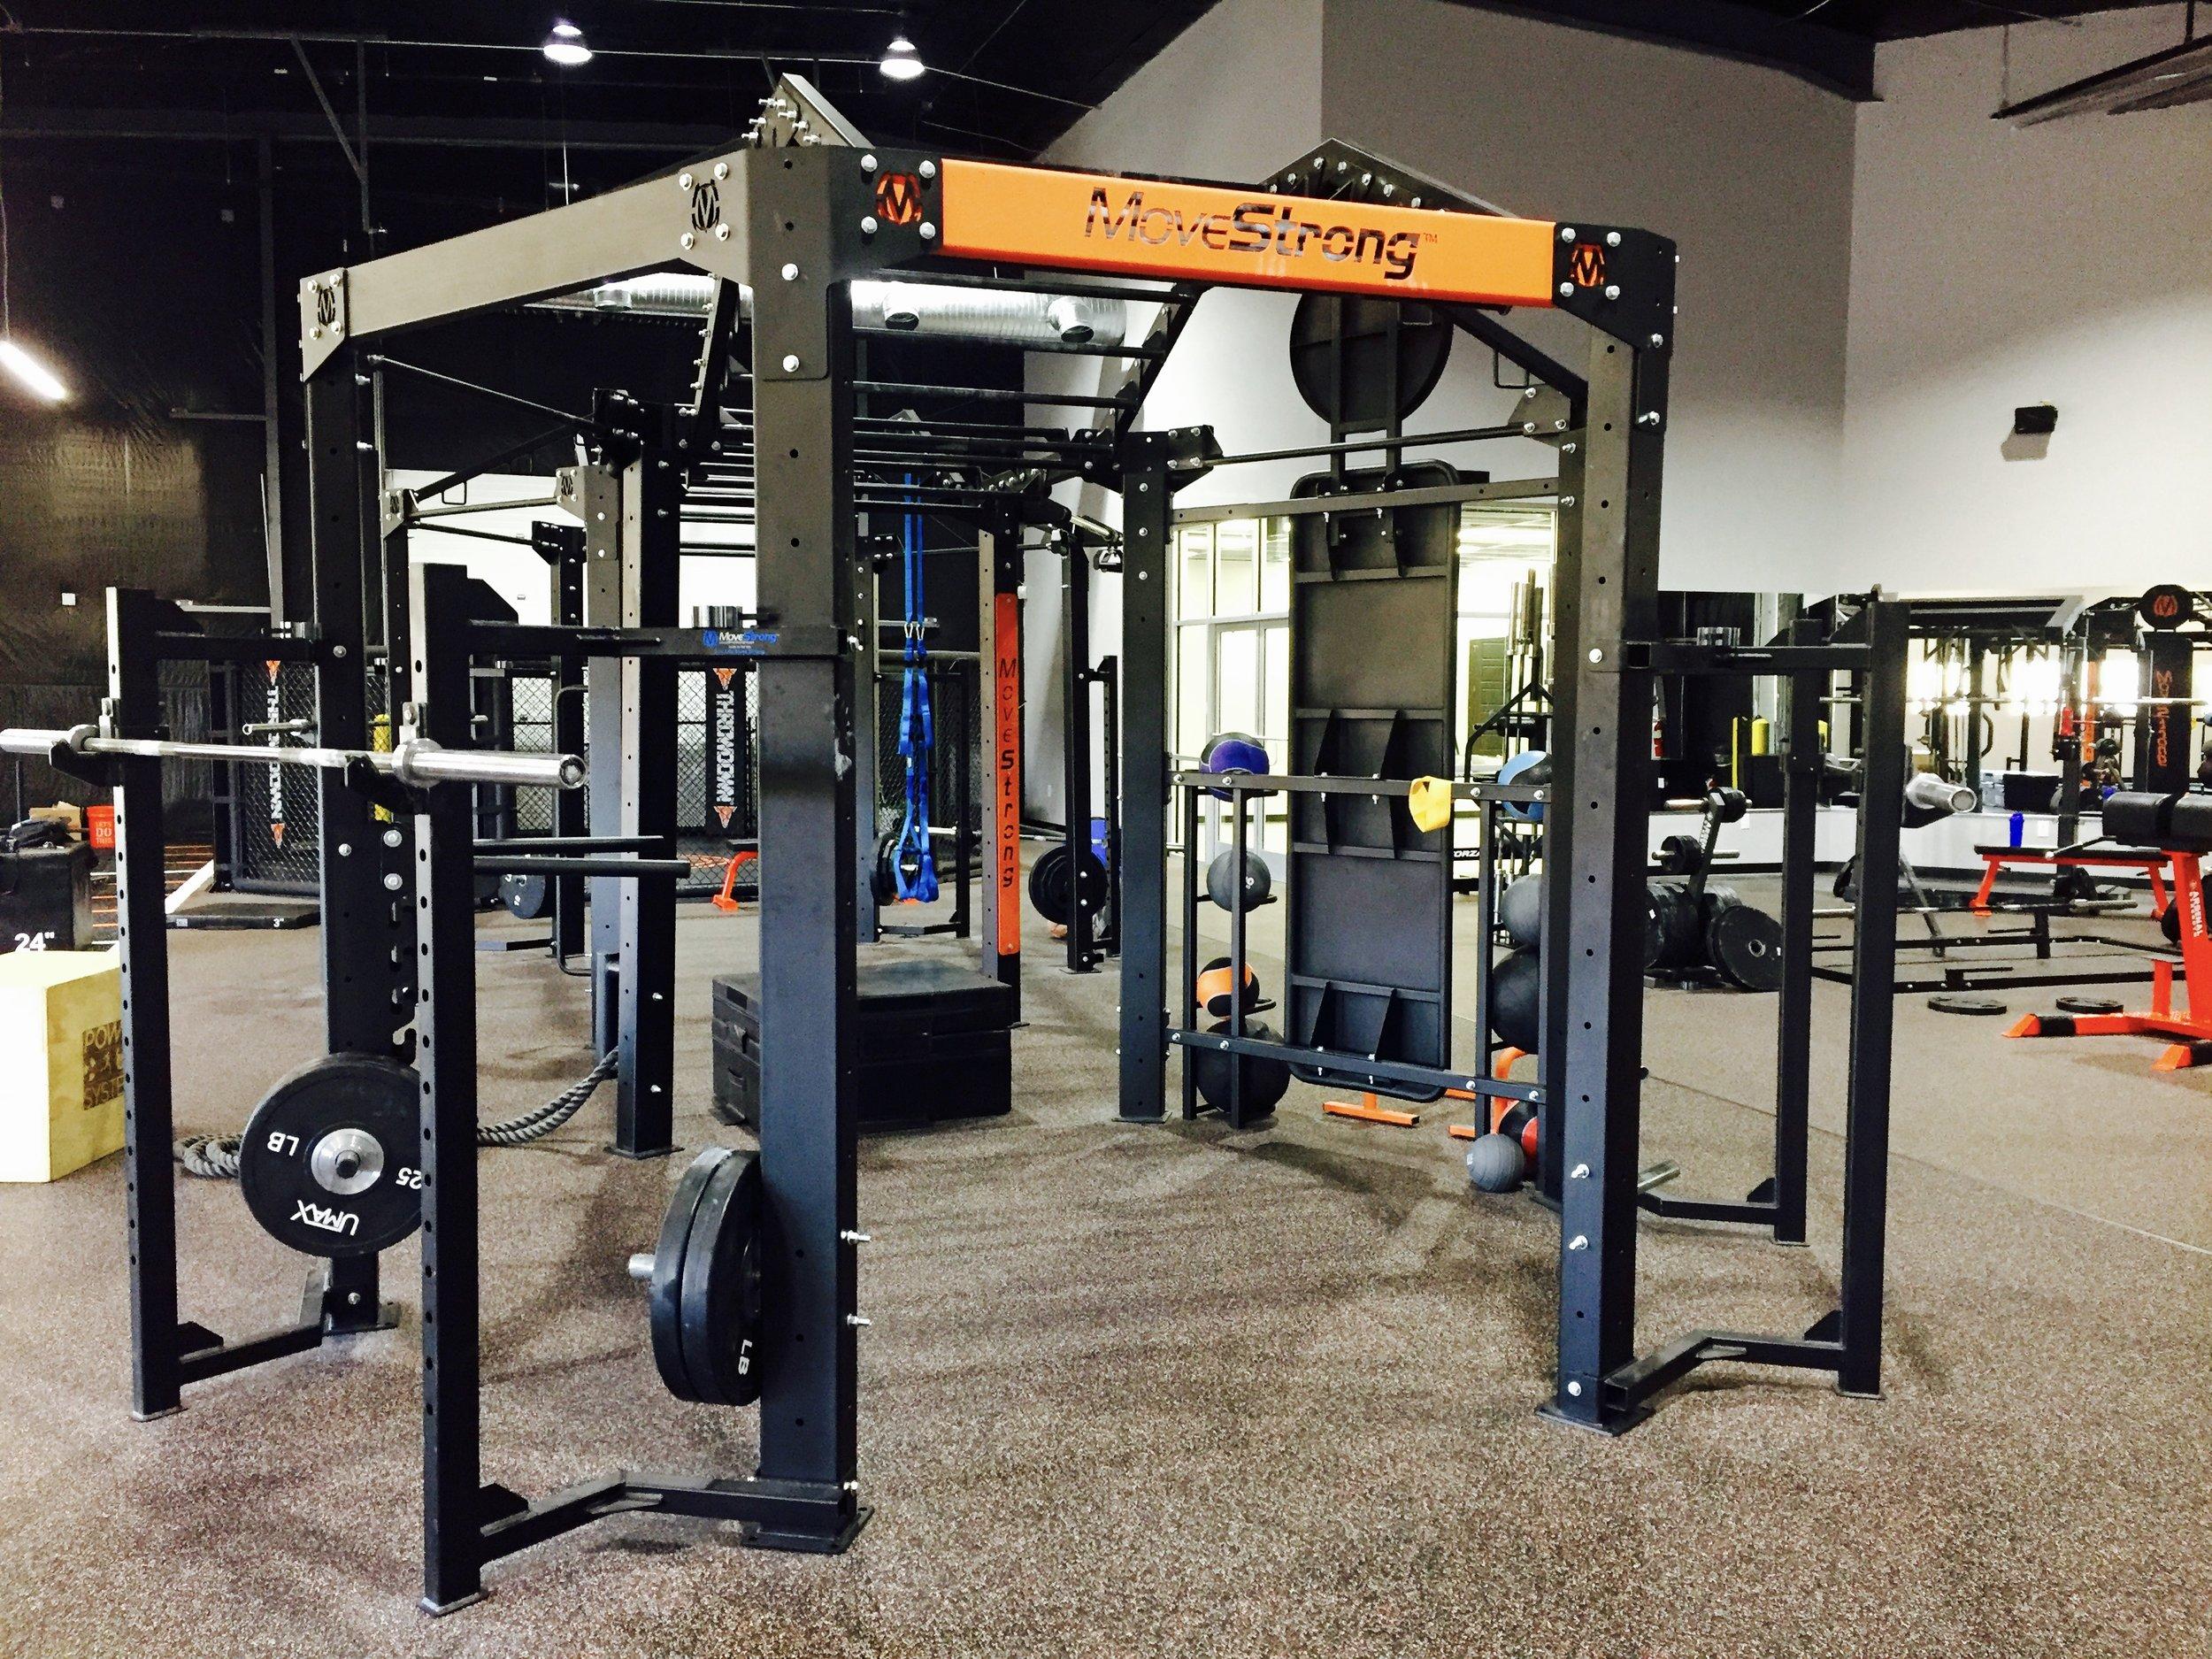 Squat racks on Nova FTS